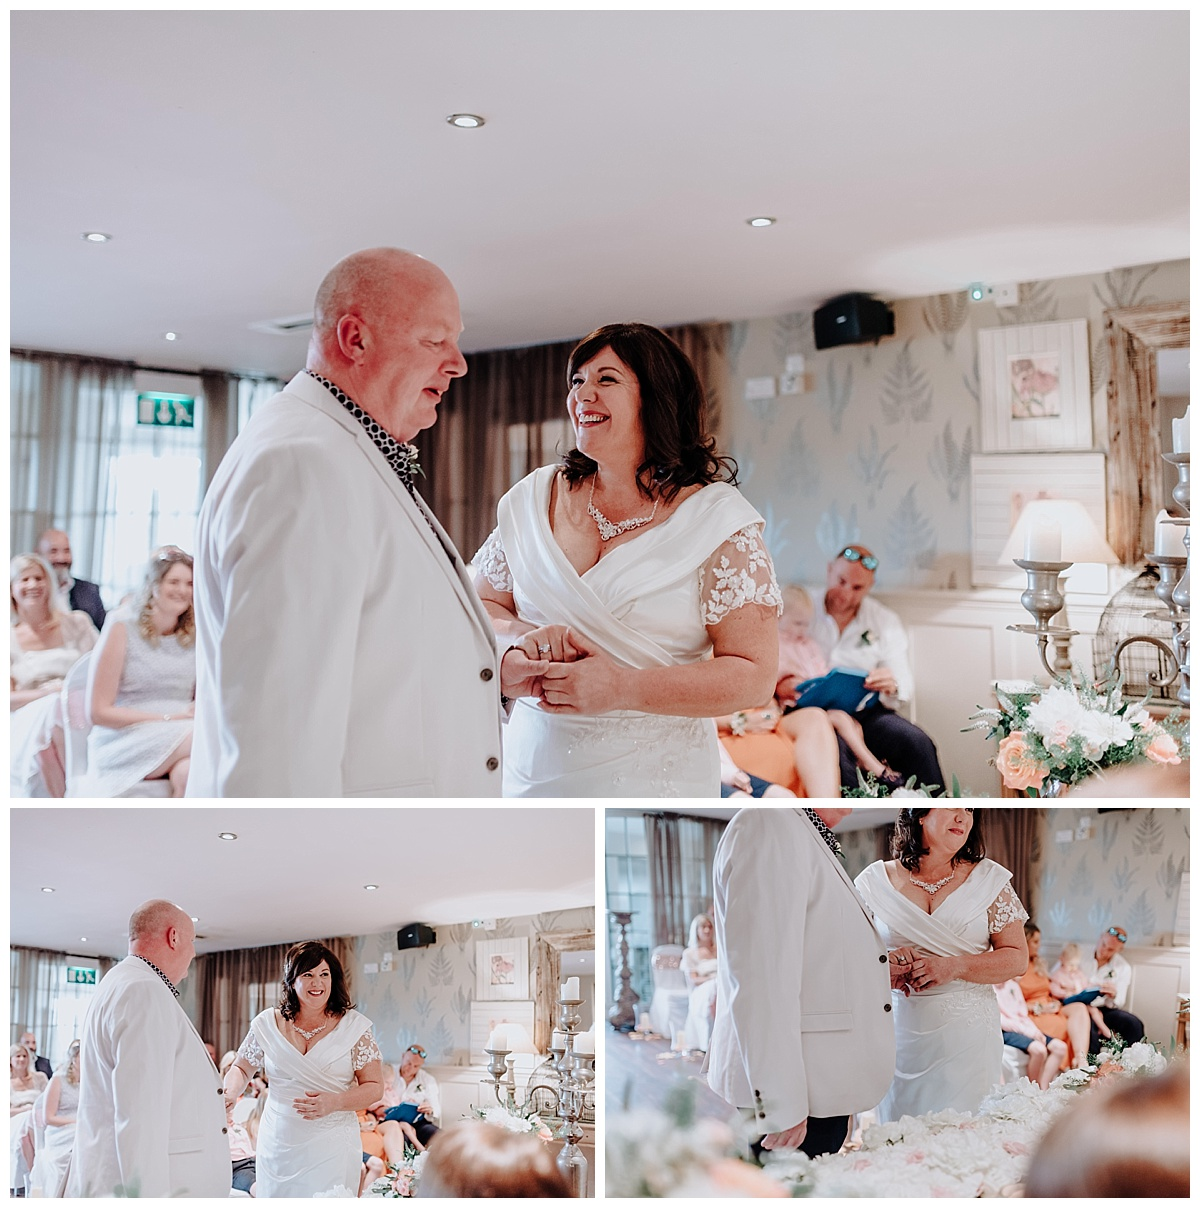 Carl & Allison saying their vows at their wedding at Great John Street Hotel